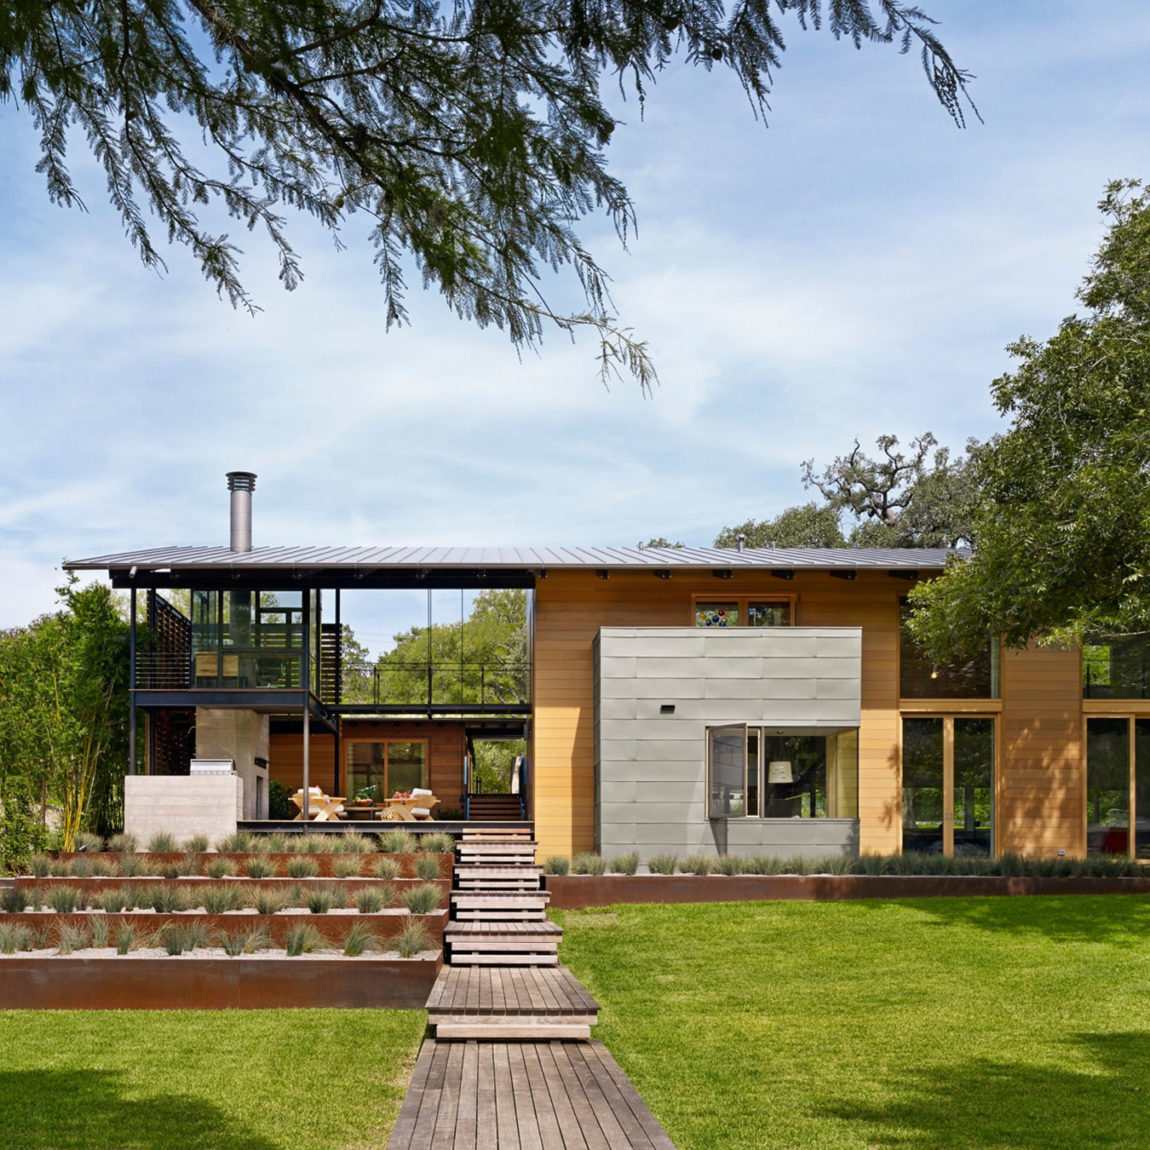 Hog Pen Creek Residence by Lake Flato Architects (1)